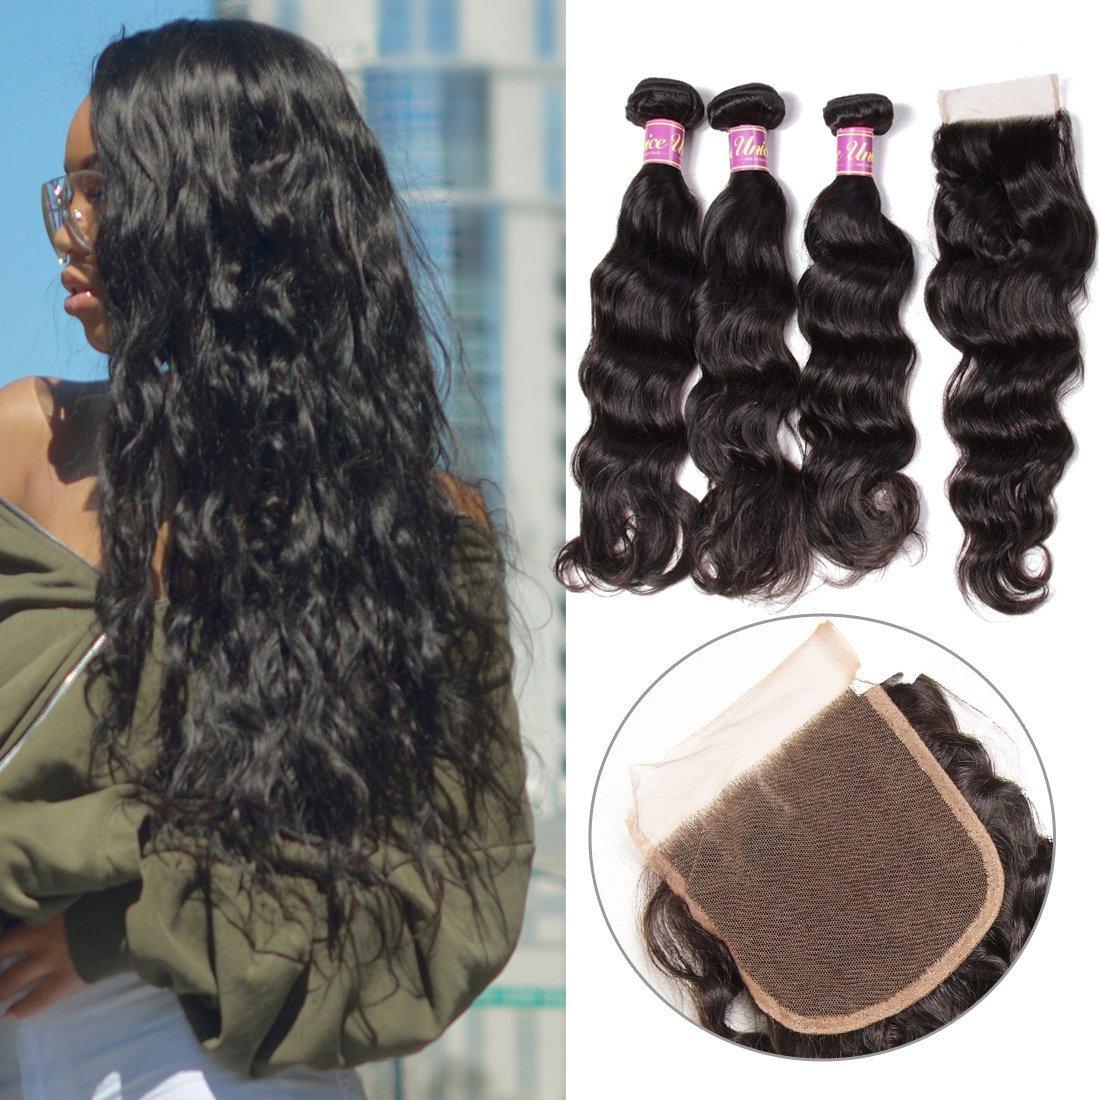 Unice 7A Grade Brazilian Natural Wave Hair 100% Virgin Human Hair 3 Bundles with Closure Natural Color (20 22 24+18Free Closure)